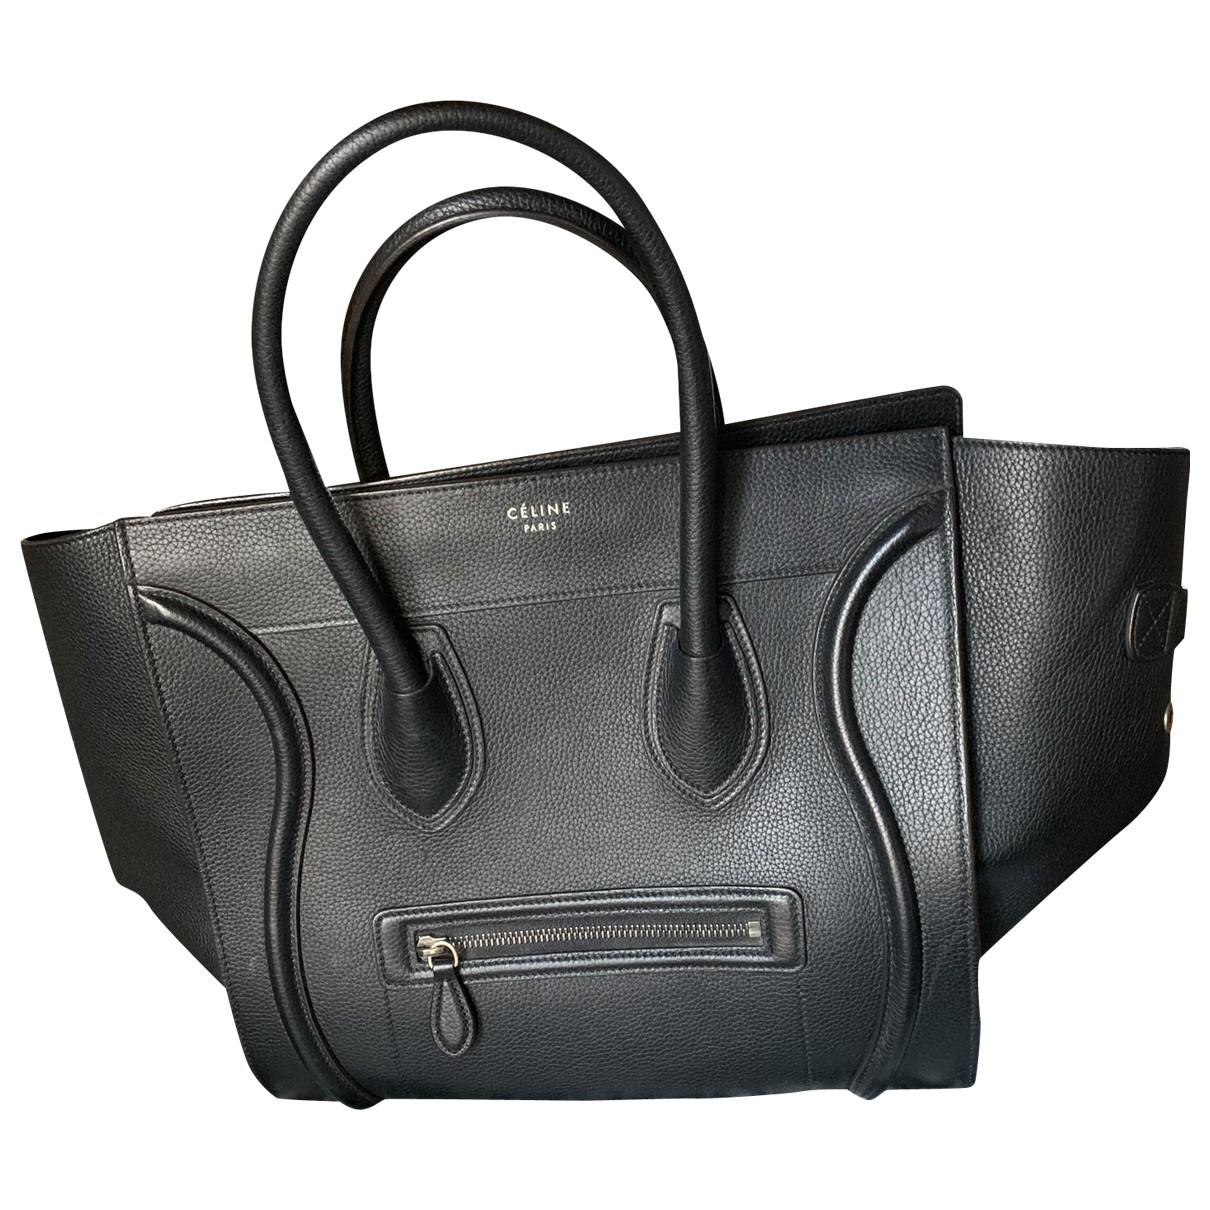 Celine Luggage Black Leather handbag for Women \N